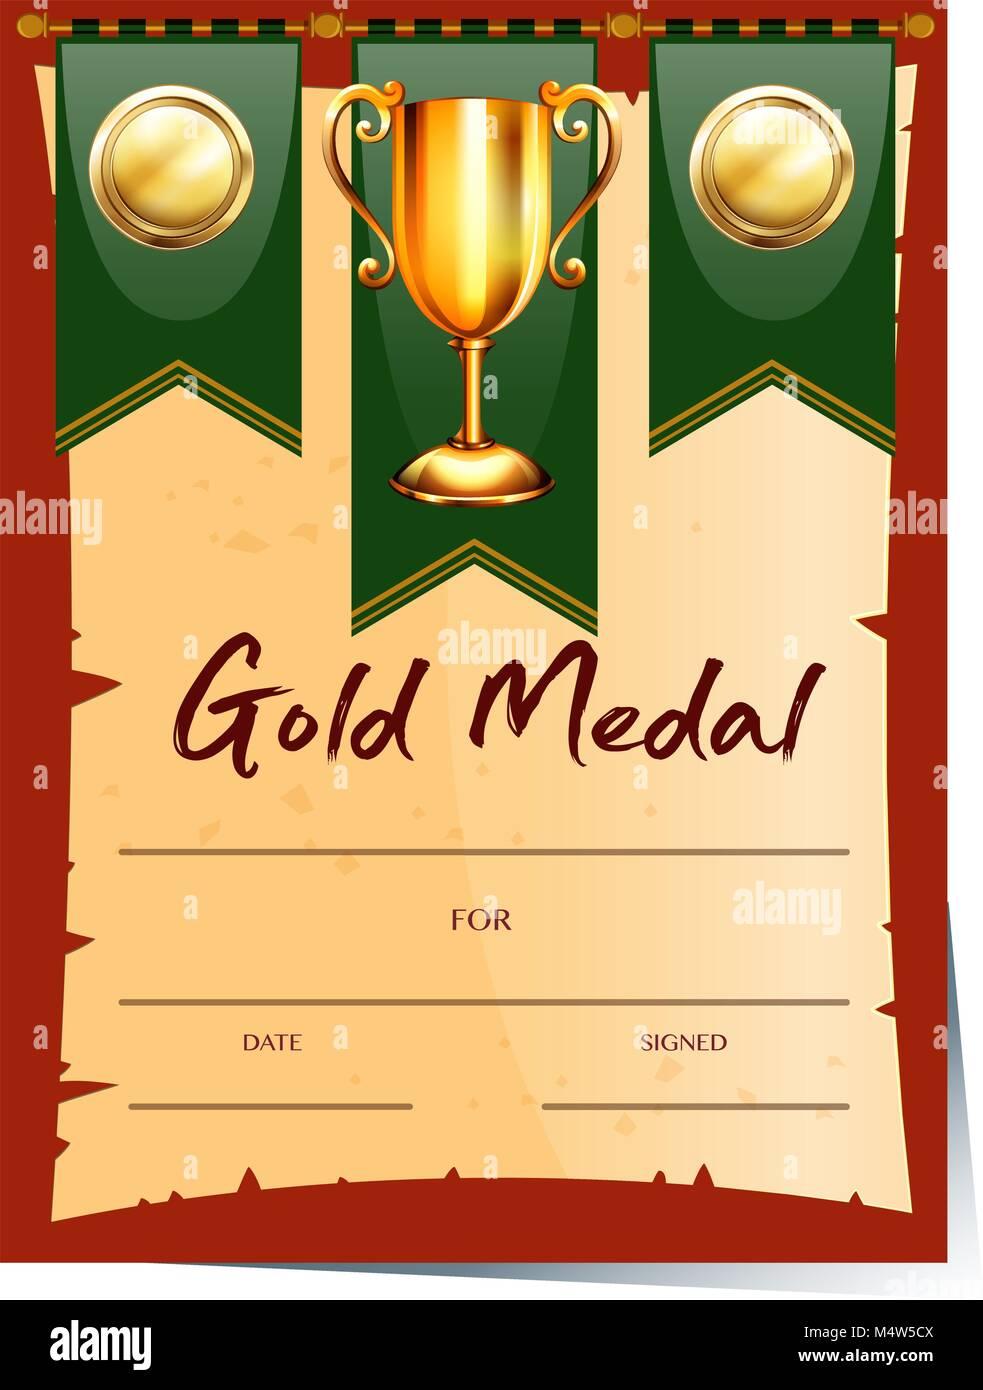 Certificate Template For Gold Medal Illustration Stock Vector Art